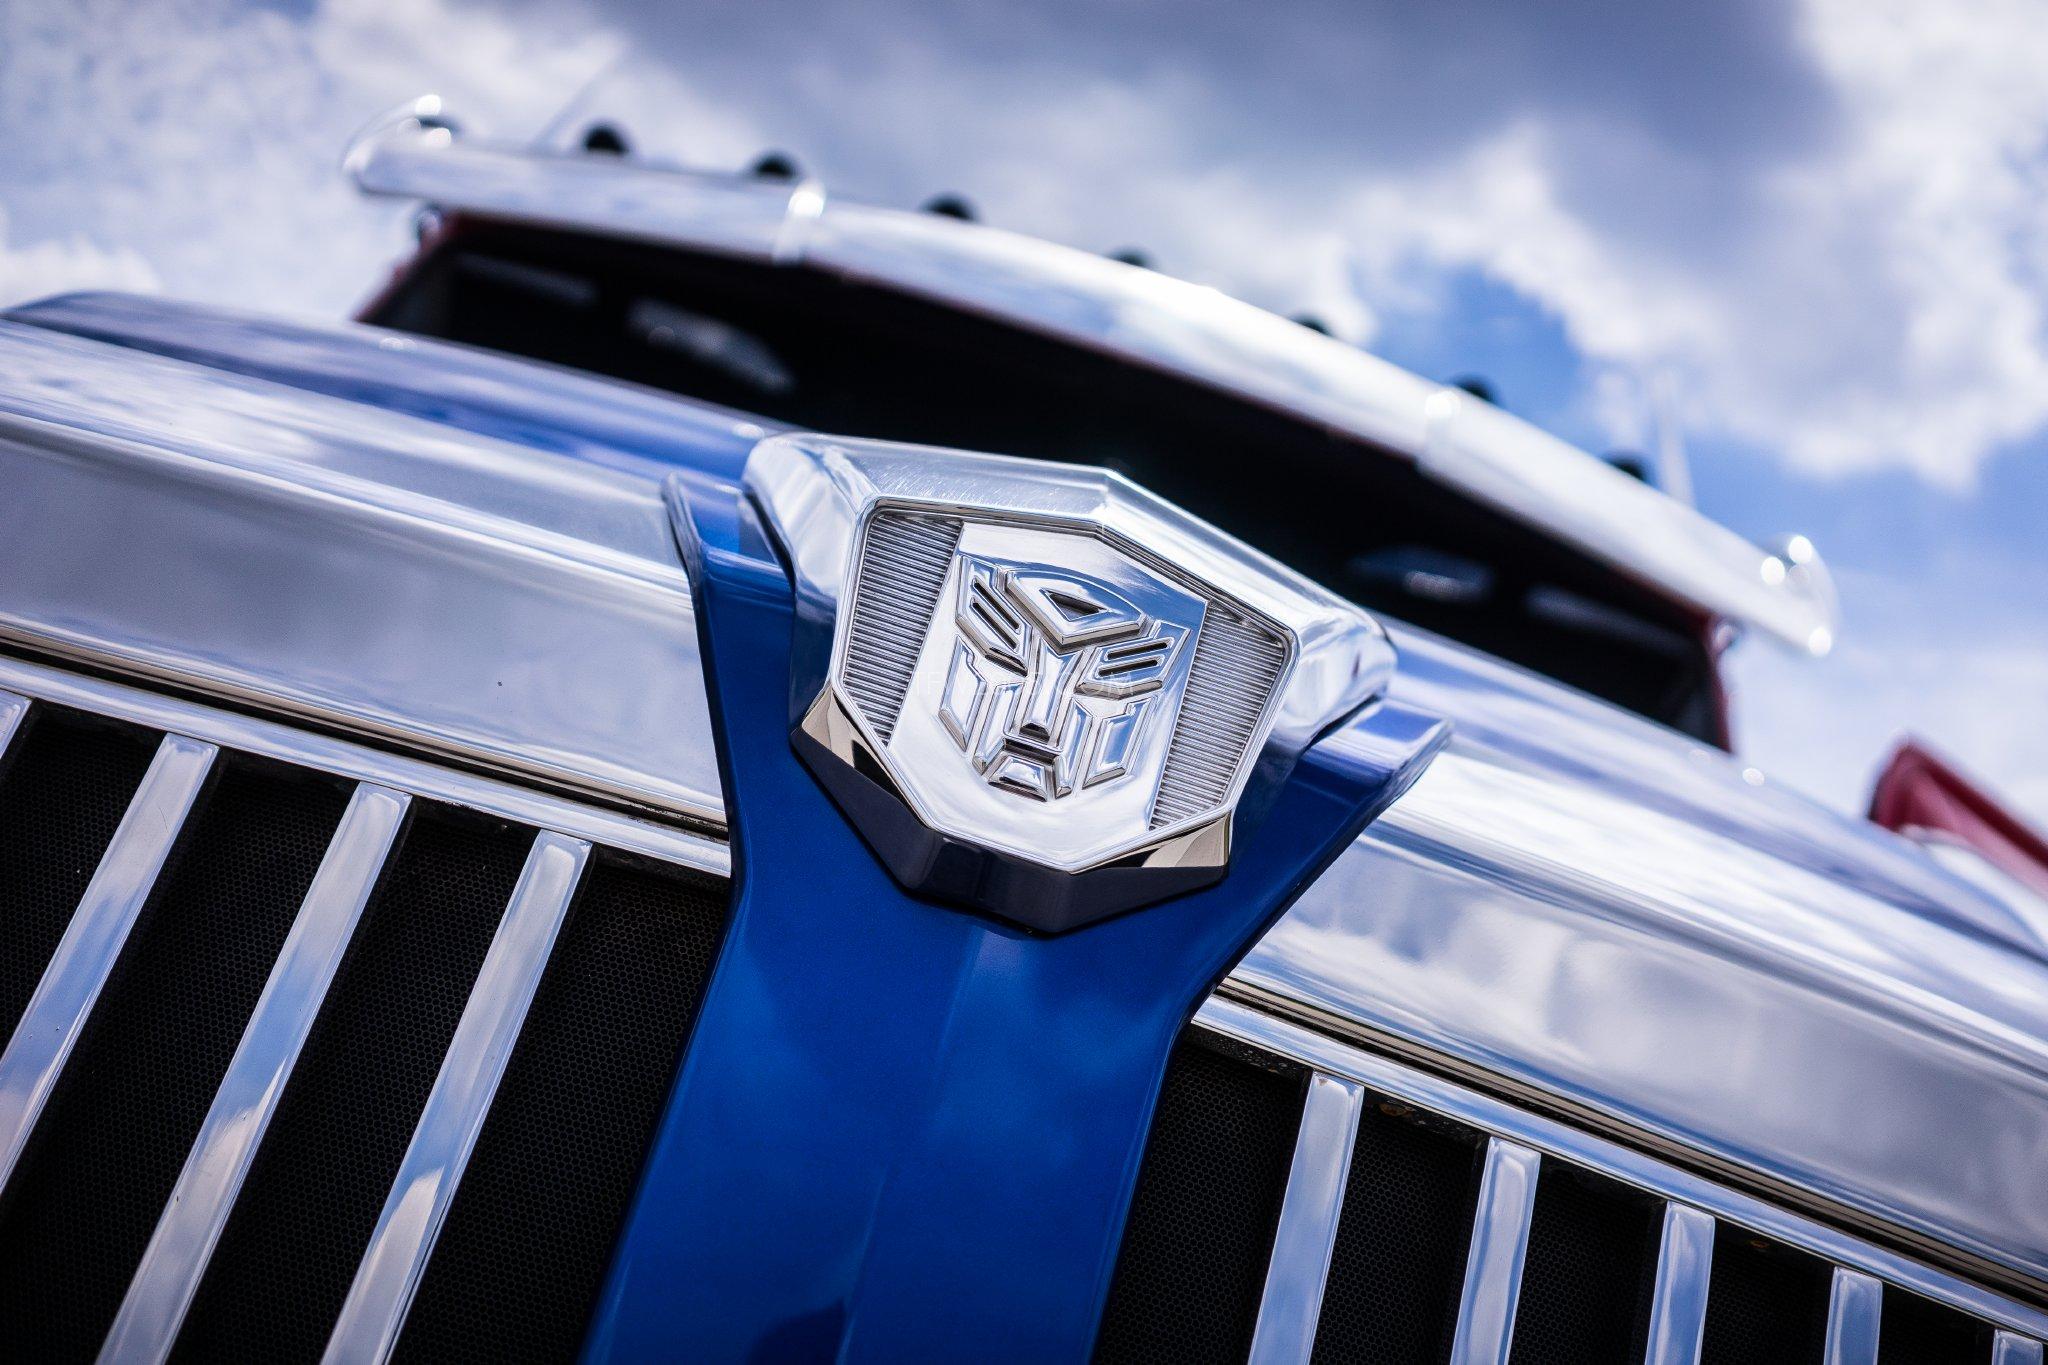 Transformers 5 Set Visit 010